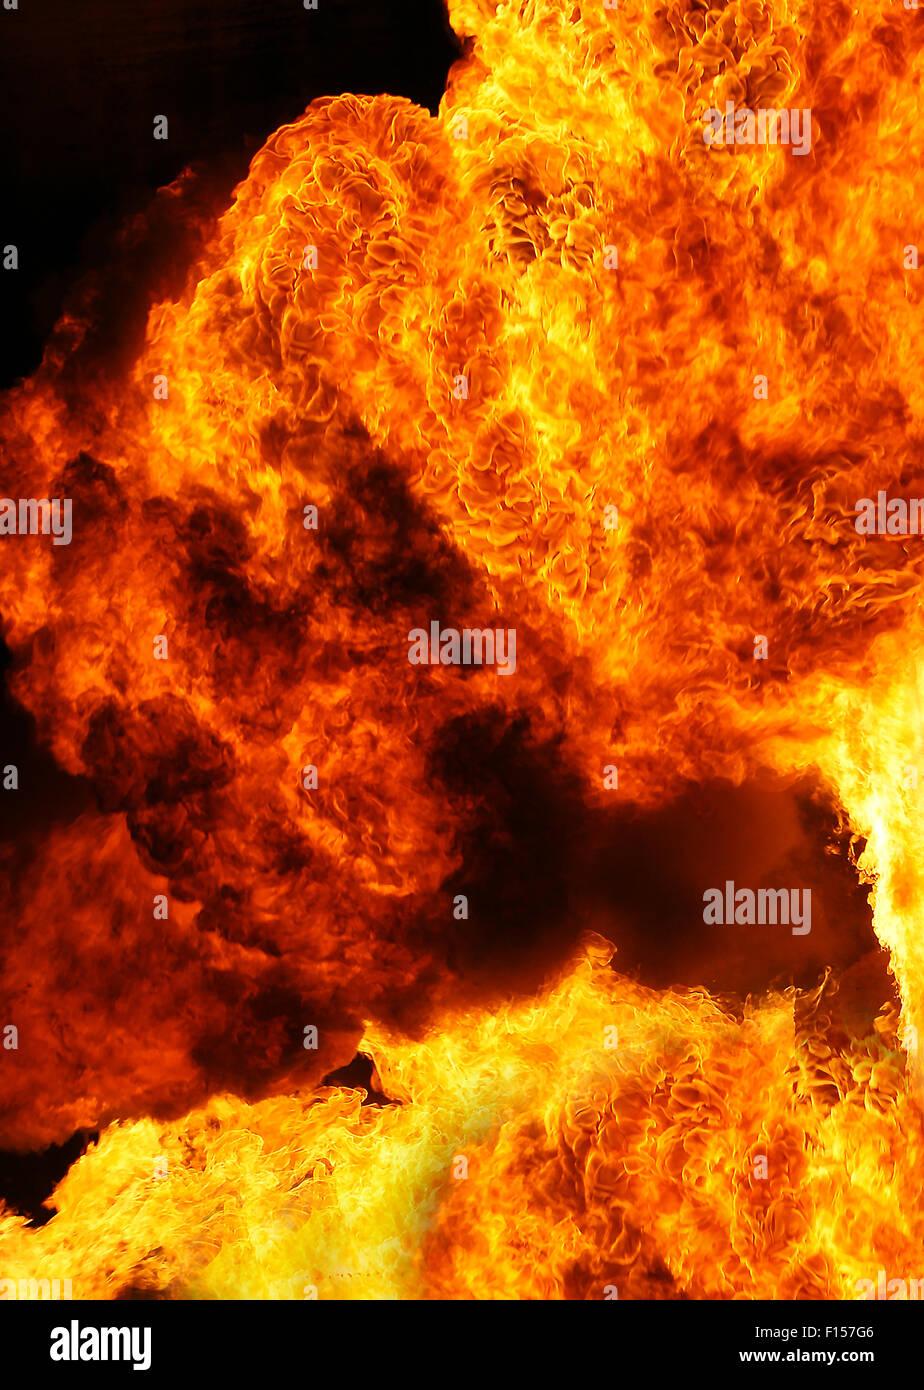 explosion, terrorist attack, IED - Stock Image